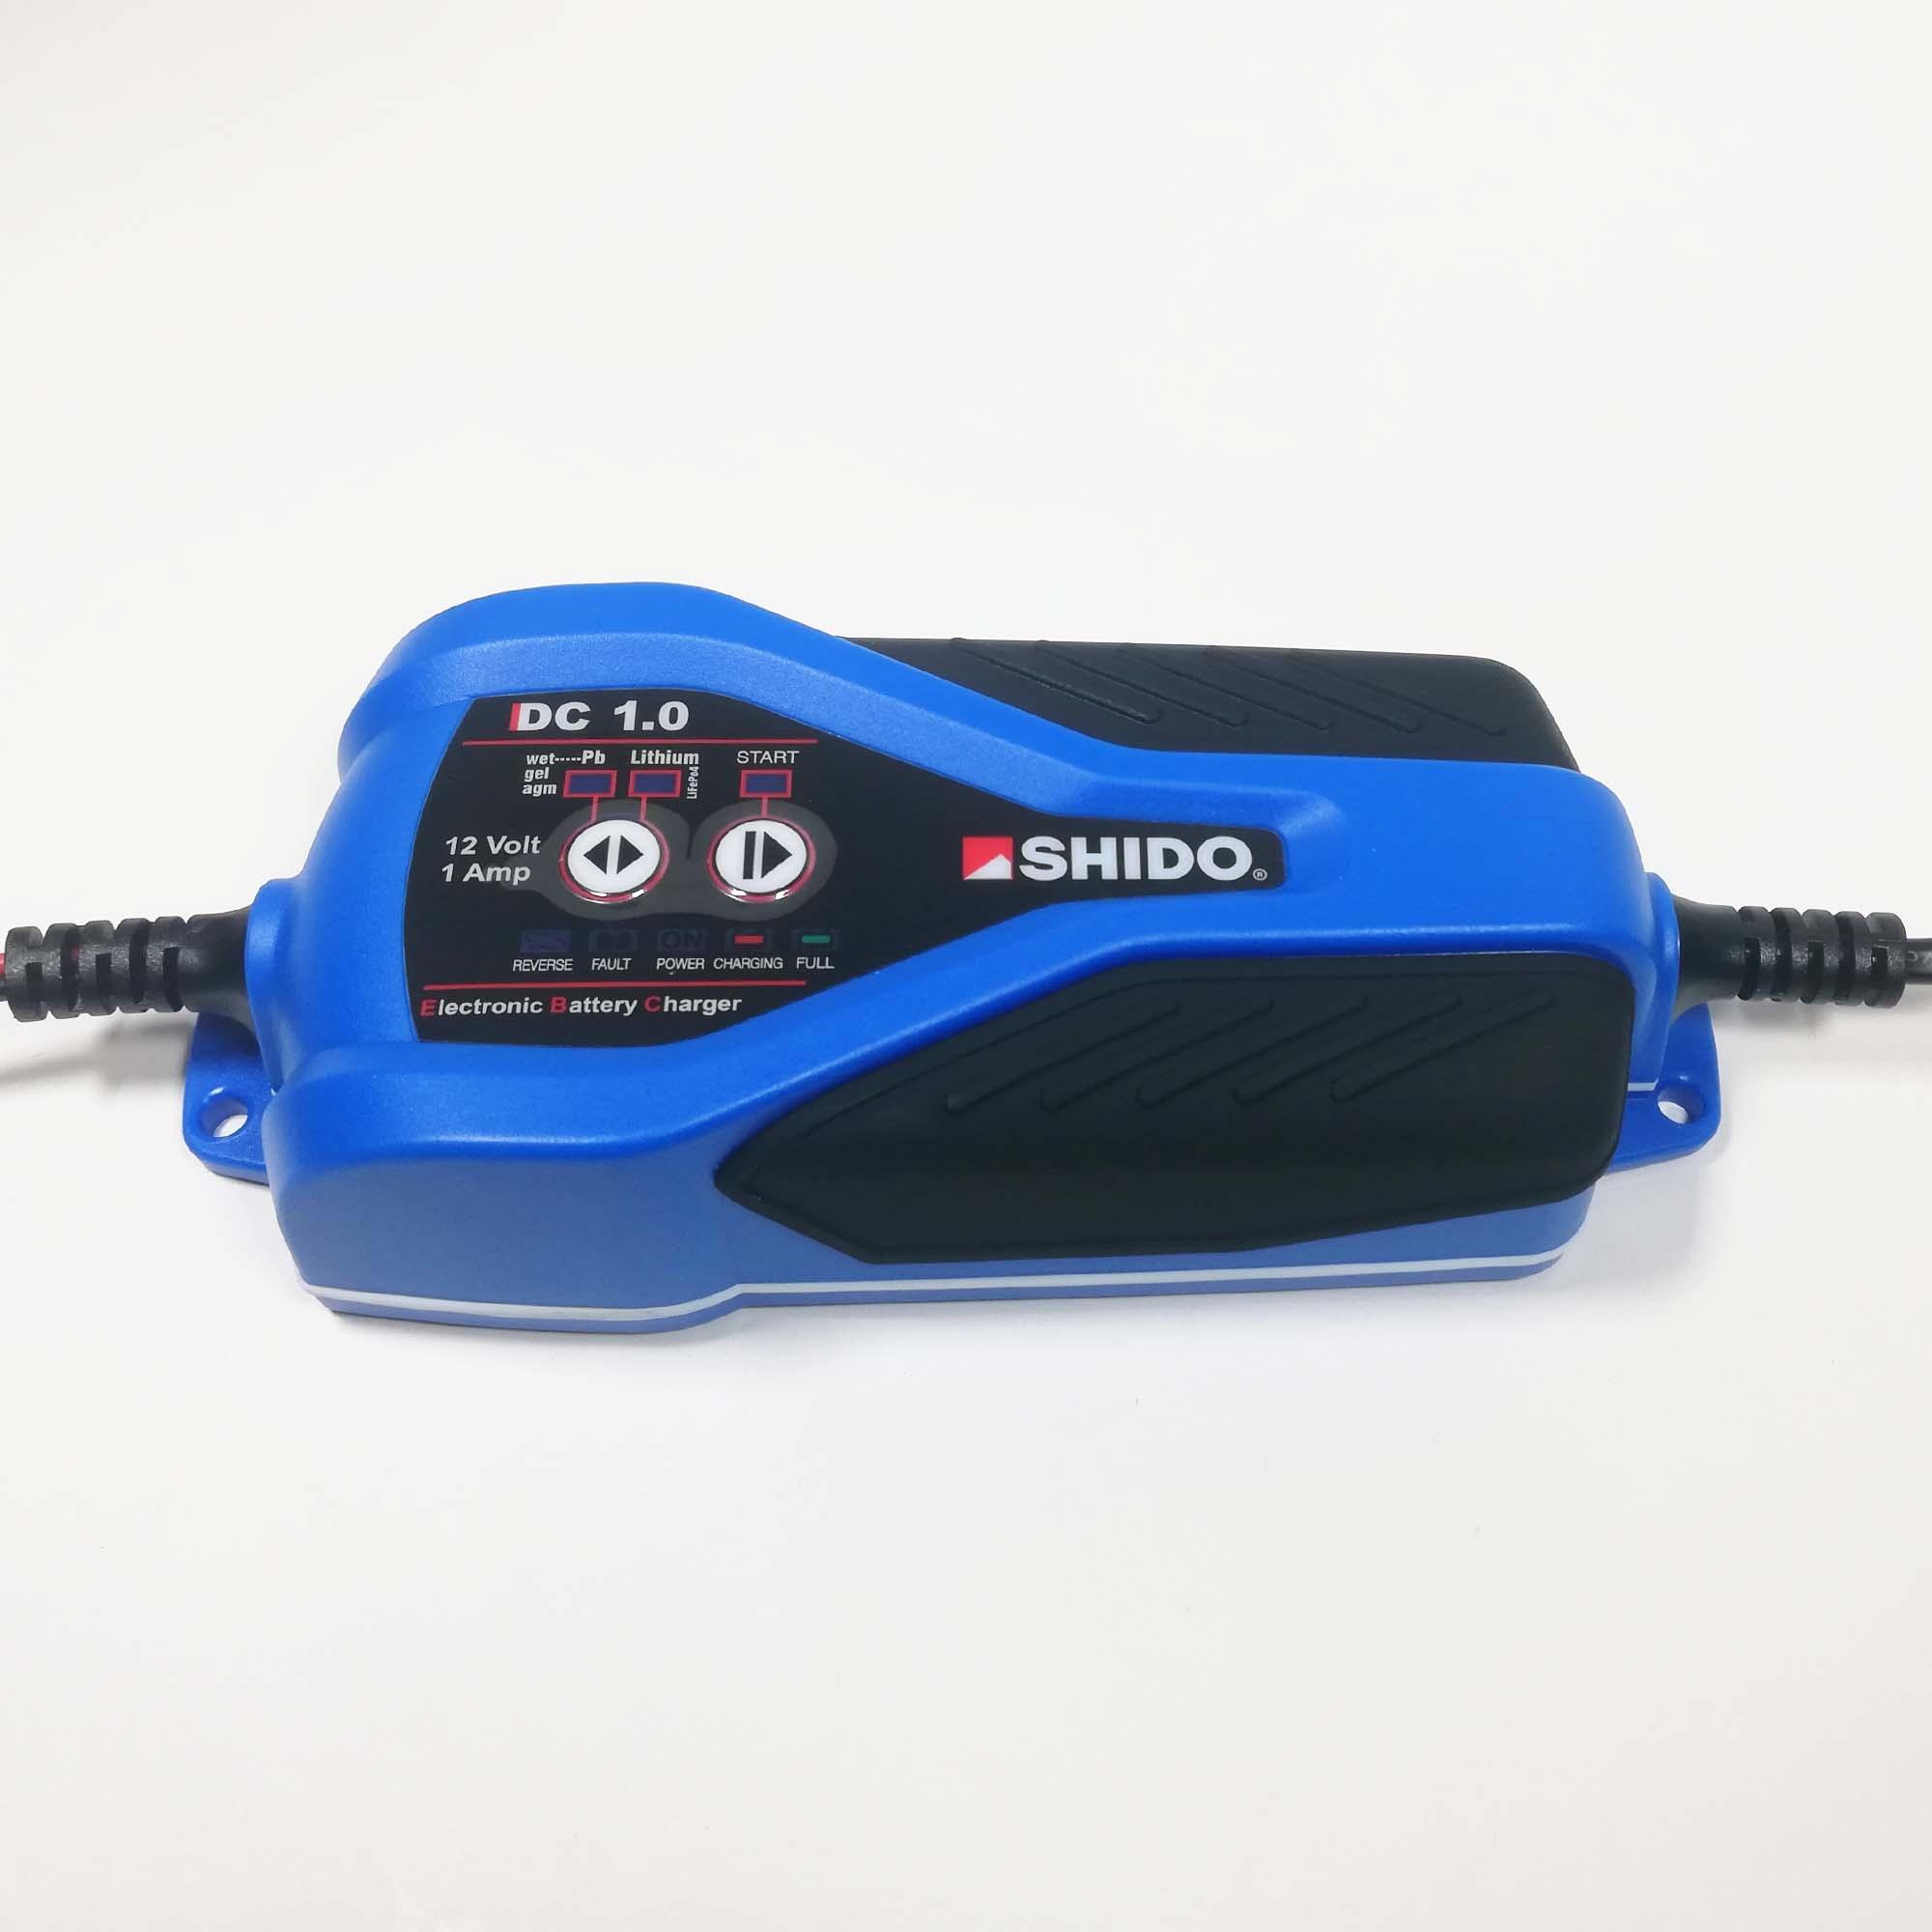 Shido Dual Batterieladegerät DC 1.0 Hard Enduro Shop